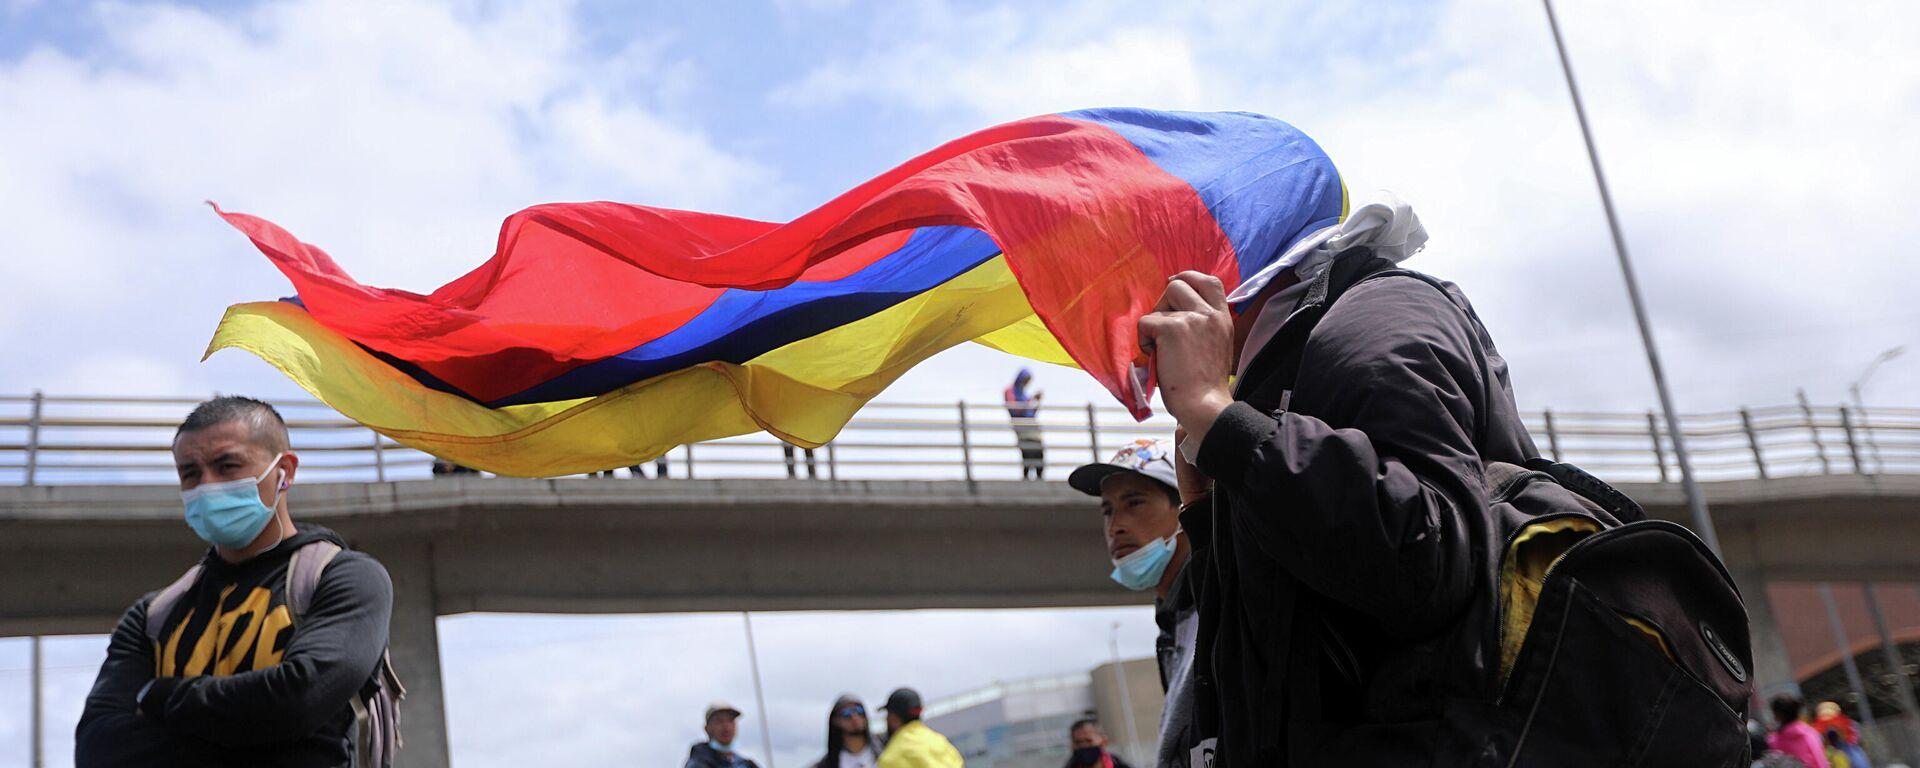 Protestas en Colombia - Sputnik Mundo, 1920, 26.05.2021